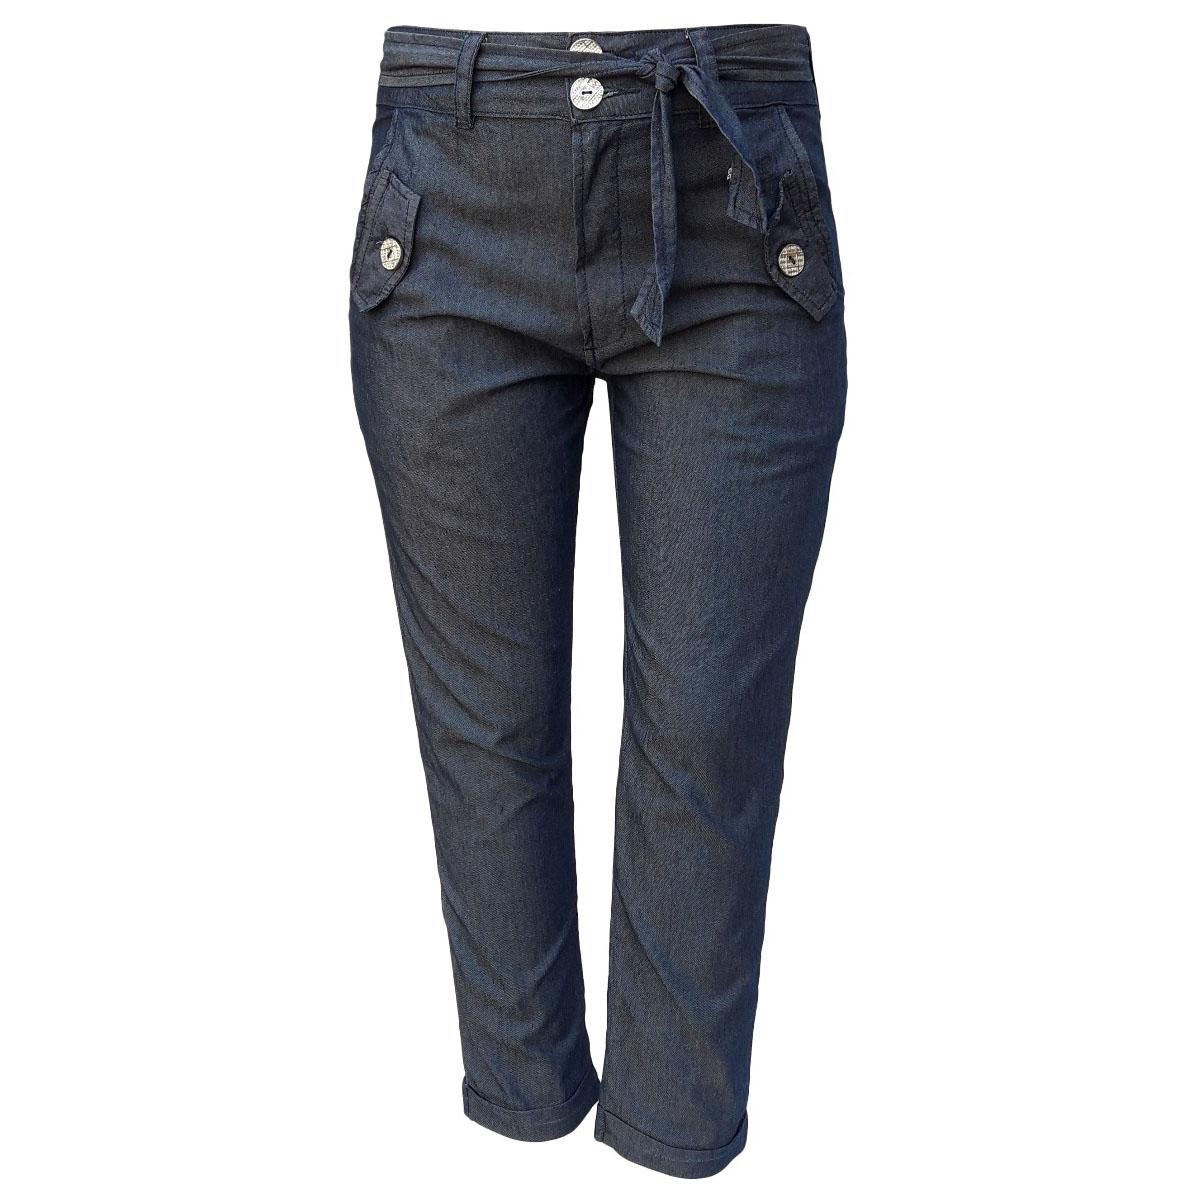 Calça Jeans Feminina Clochard Cintura Alta Tamanho P